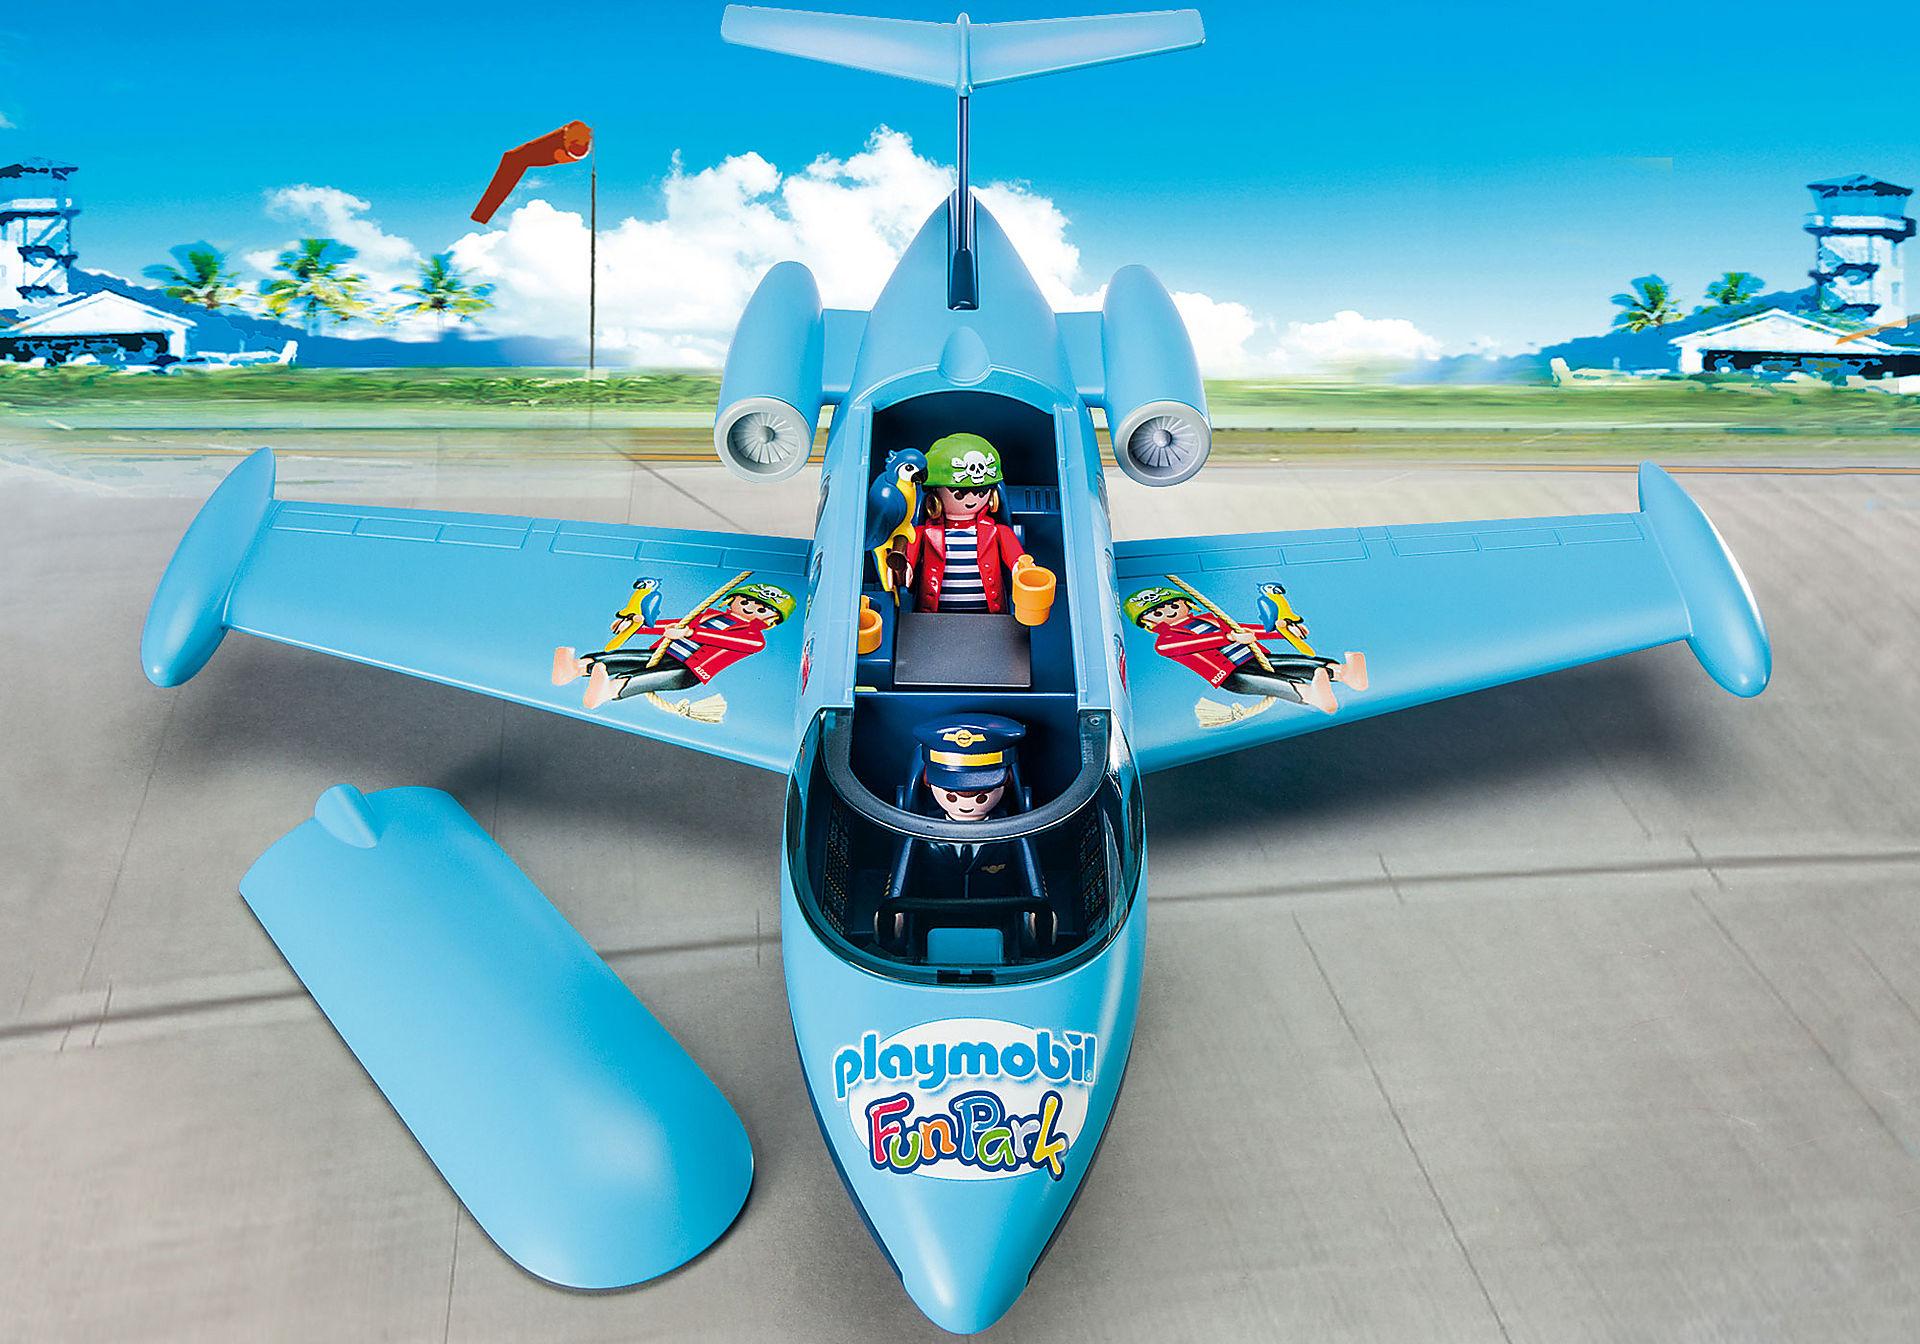 9366 PLAYMOBIL FunPark Summer Jet zoom image5